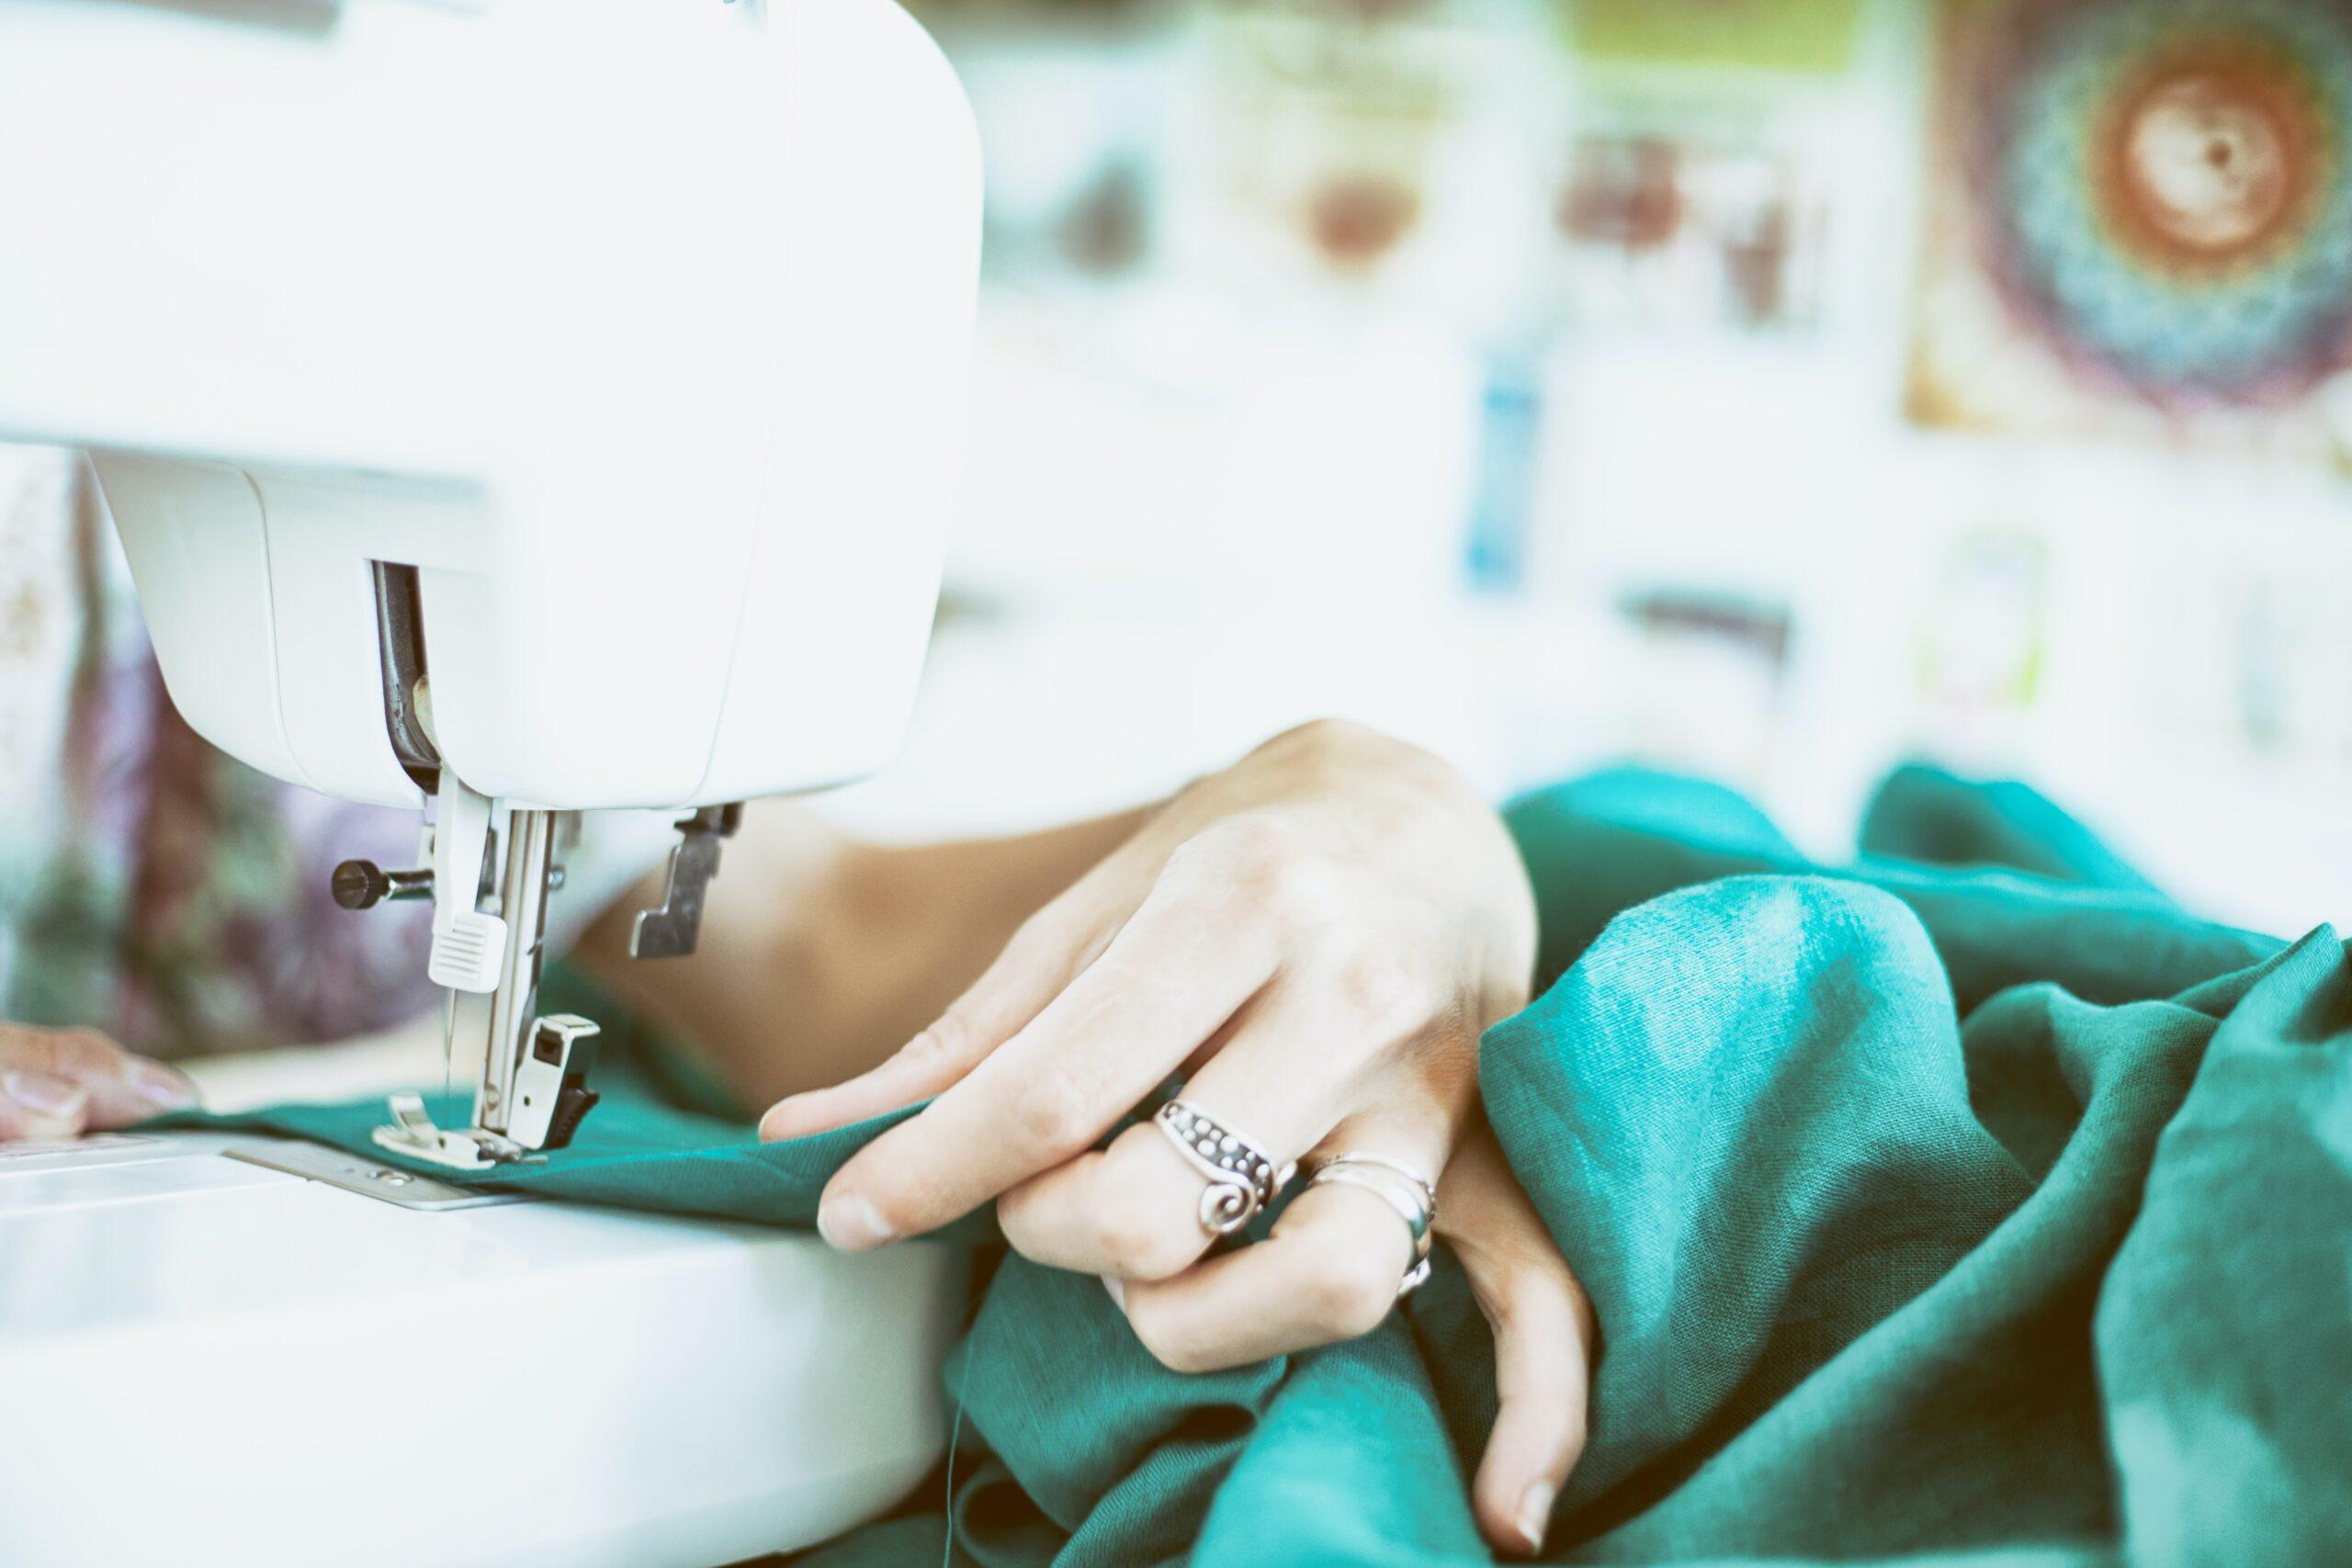 Best Sewing Machines 2021